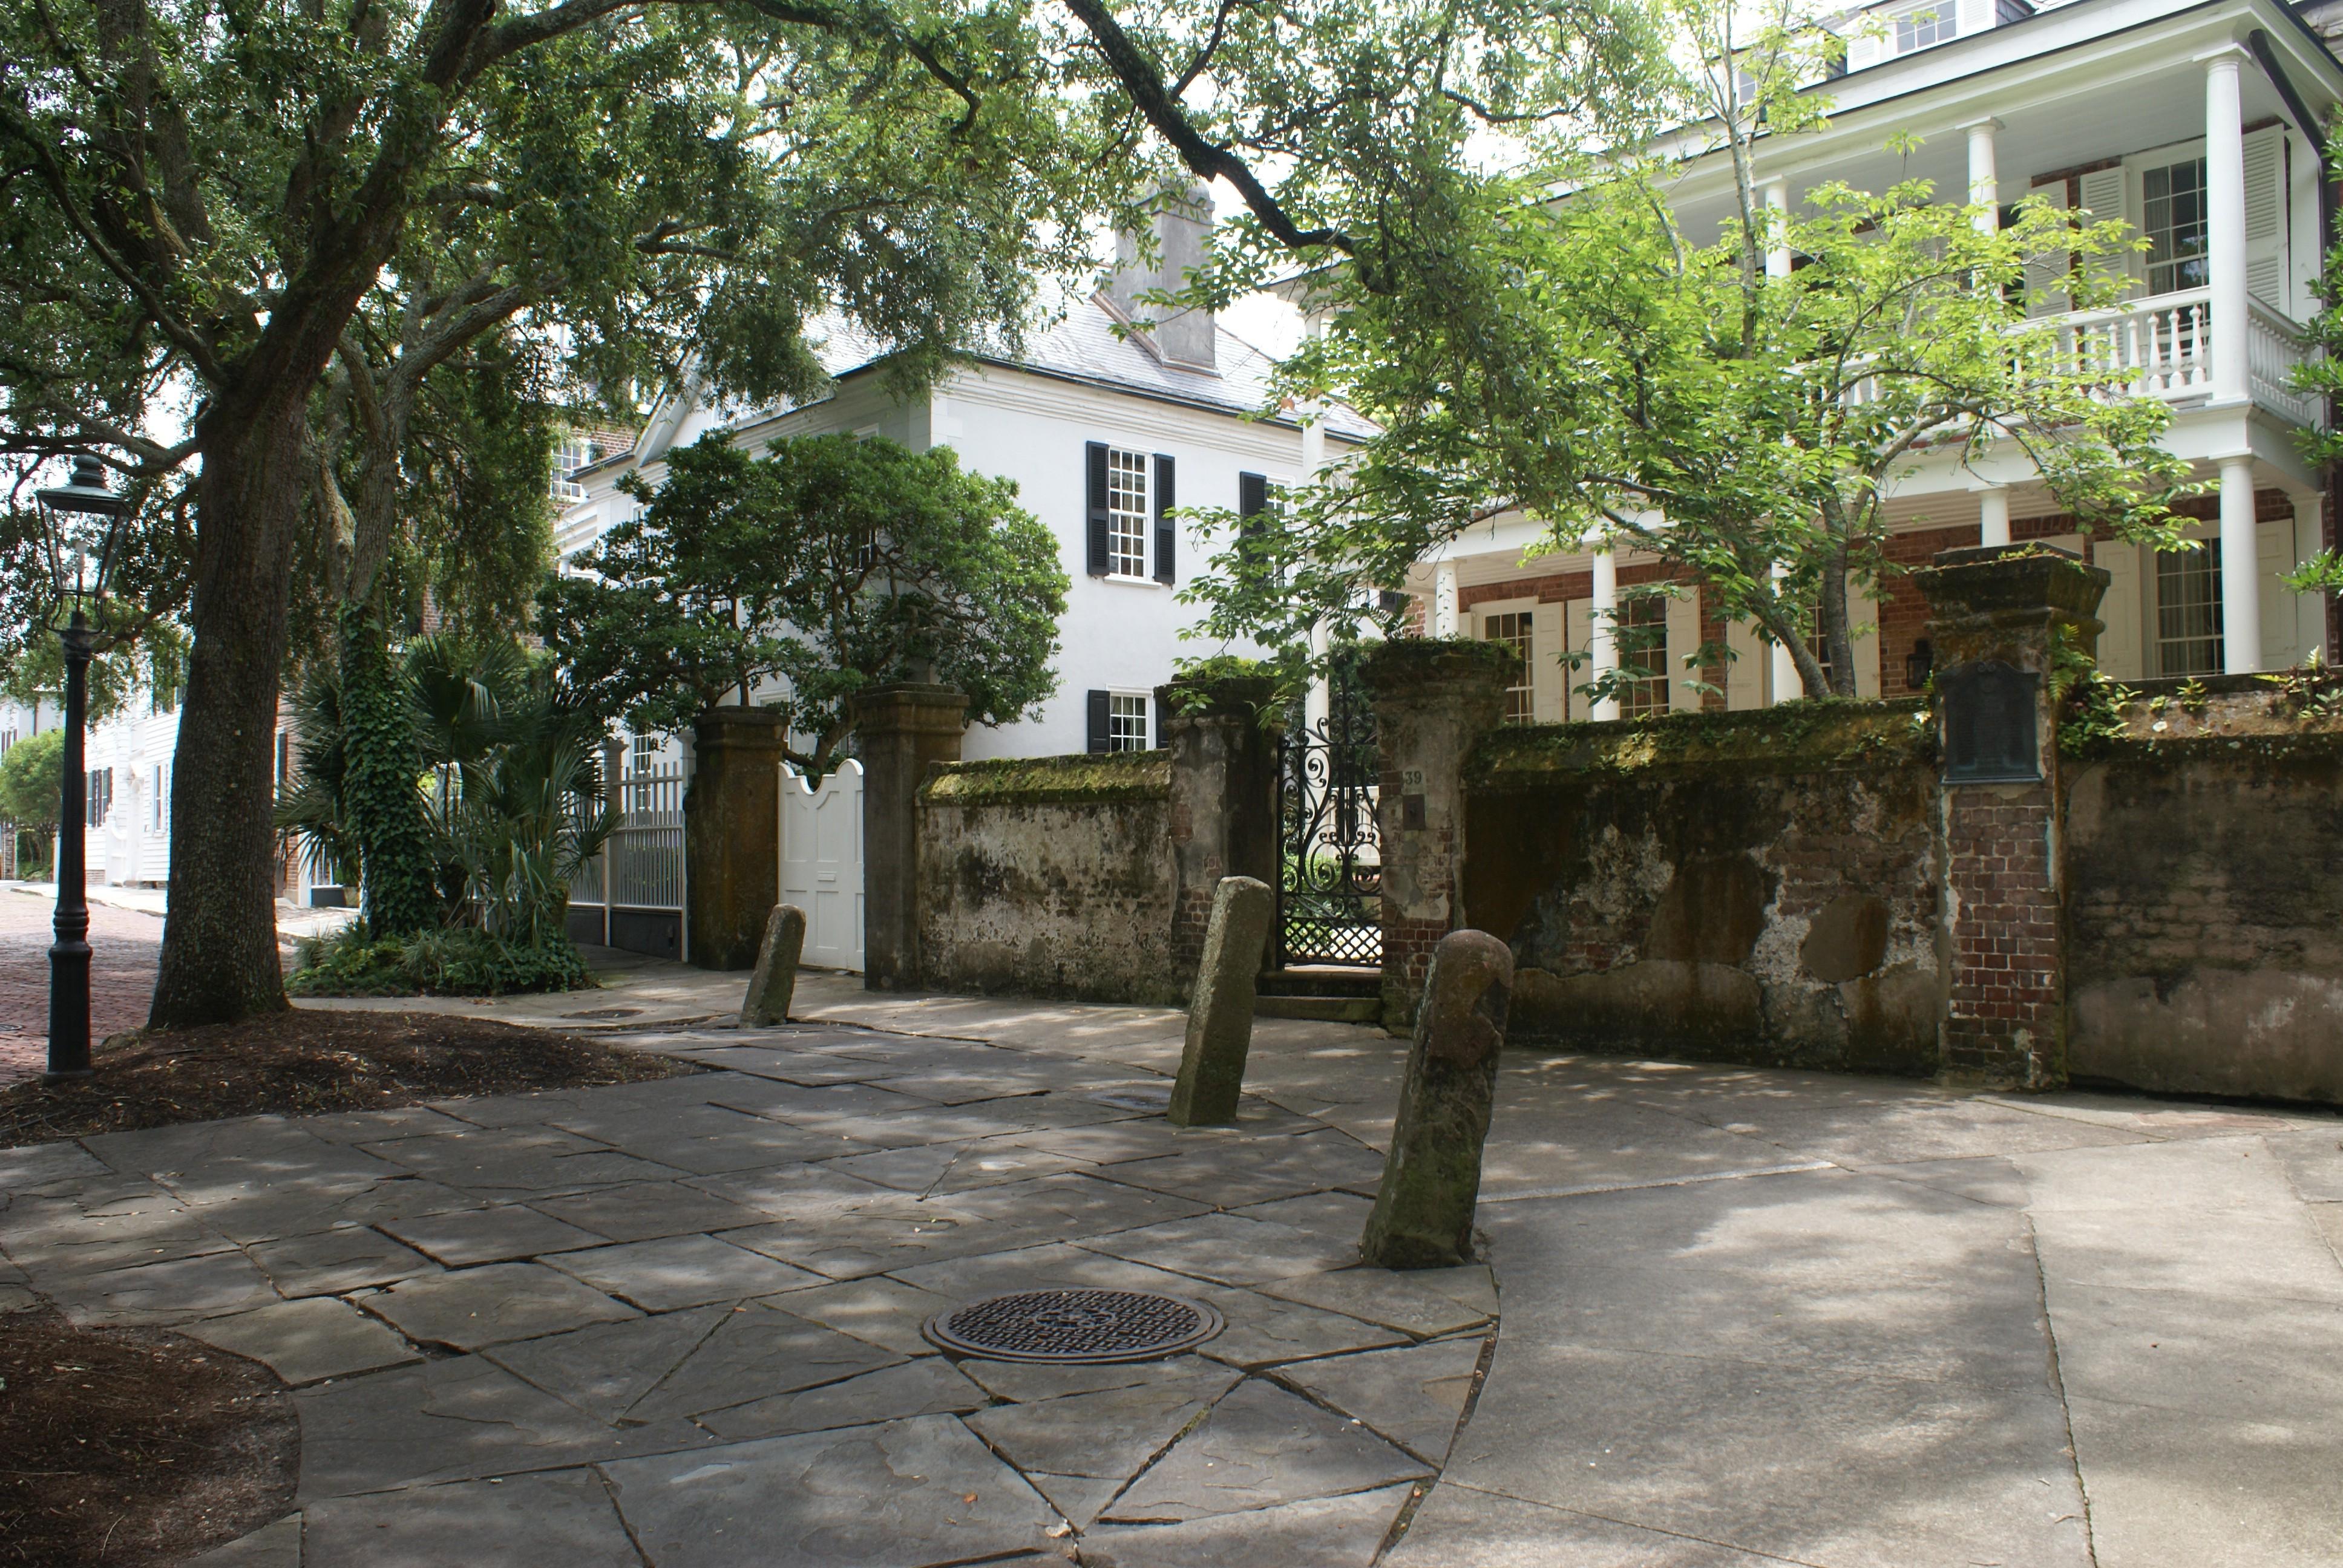 George Eveleigh House in Charleston